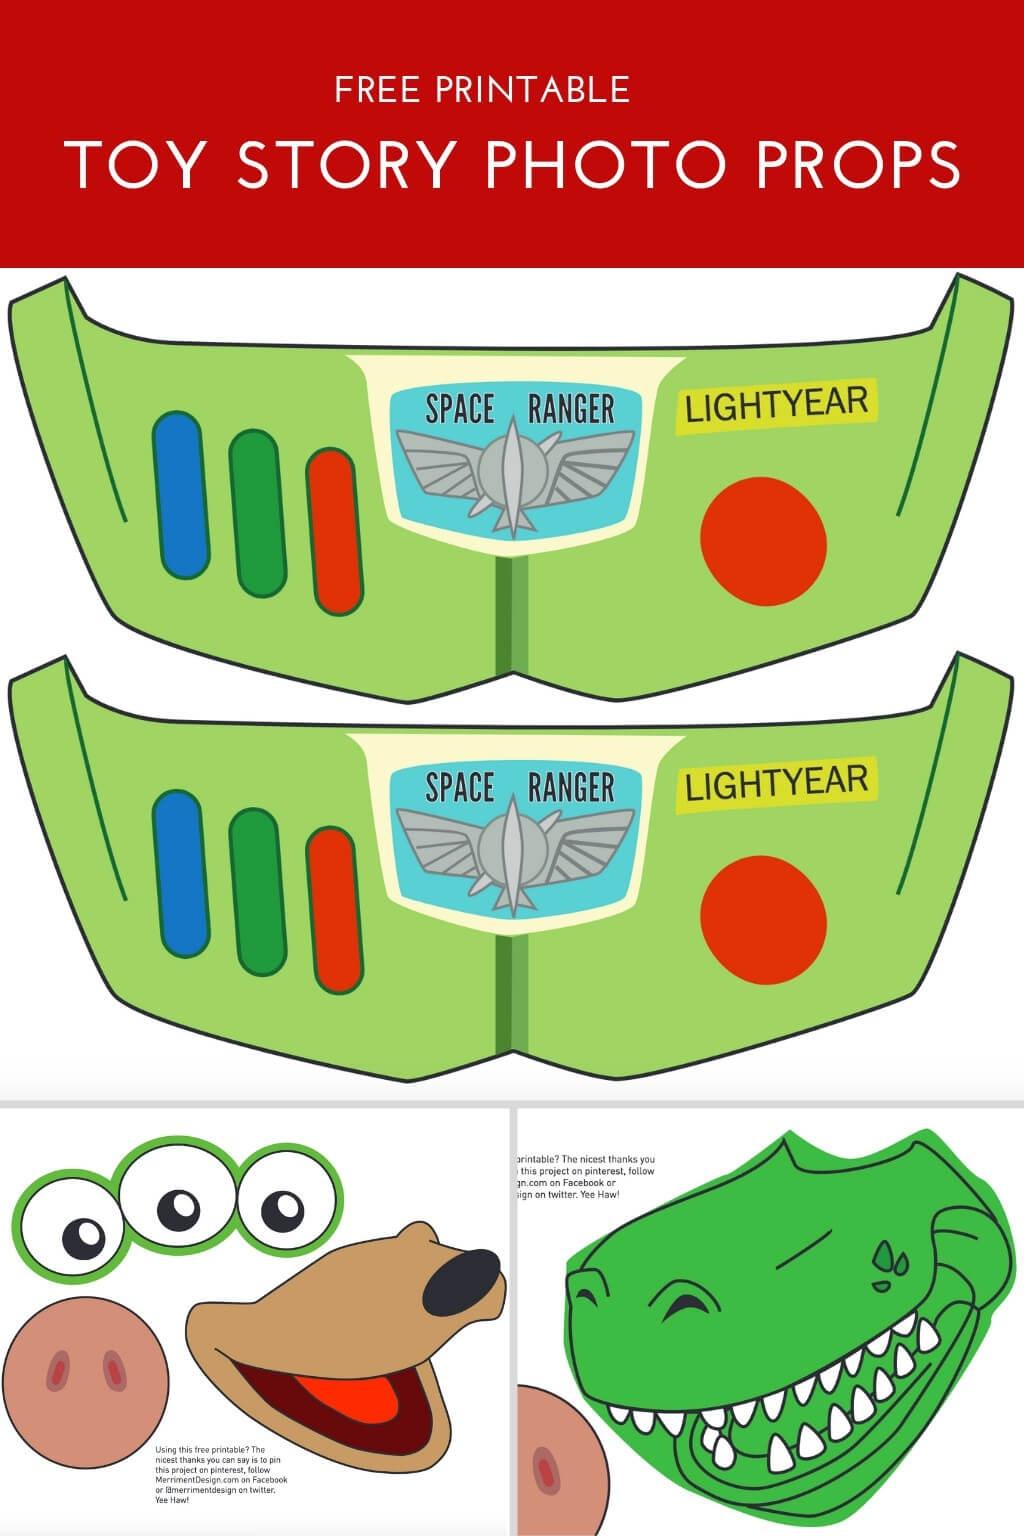 Toy Story Photo Booth Props {Free Printable Pdf} - Merriment Design - Free Photo Booth Props Printable Pdf